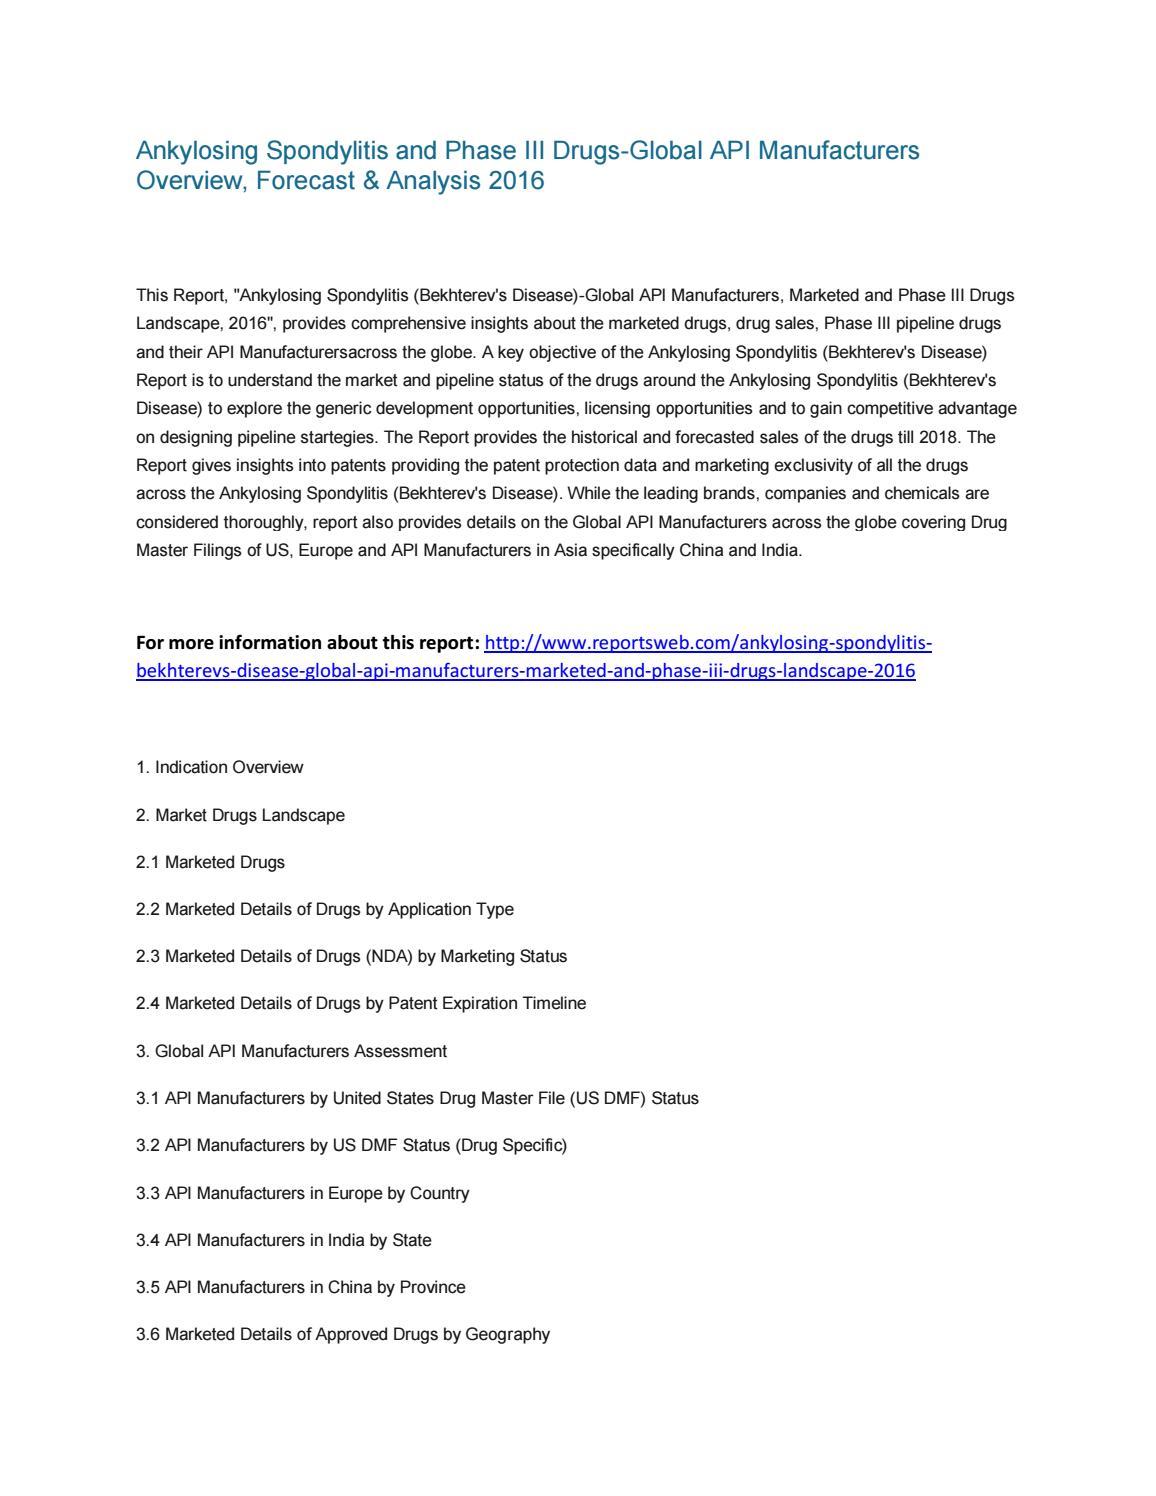 global ankylosing spondylitis market